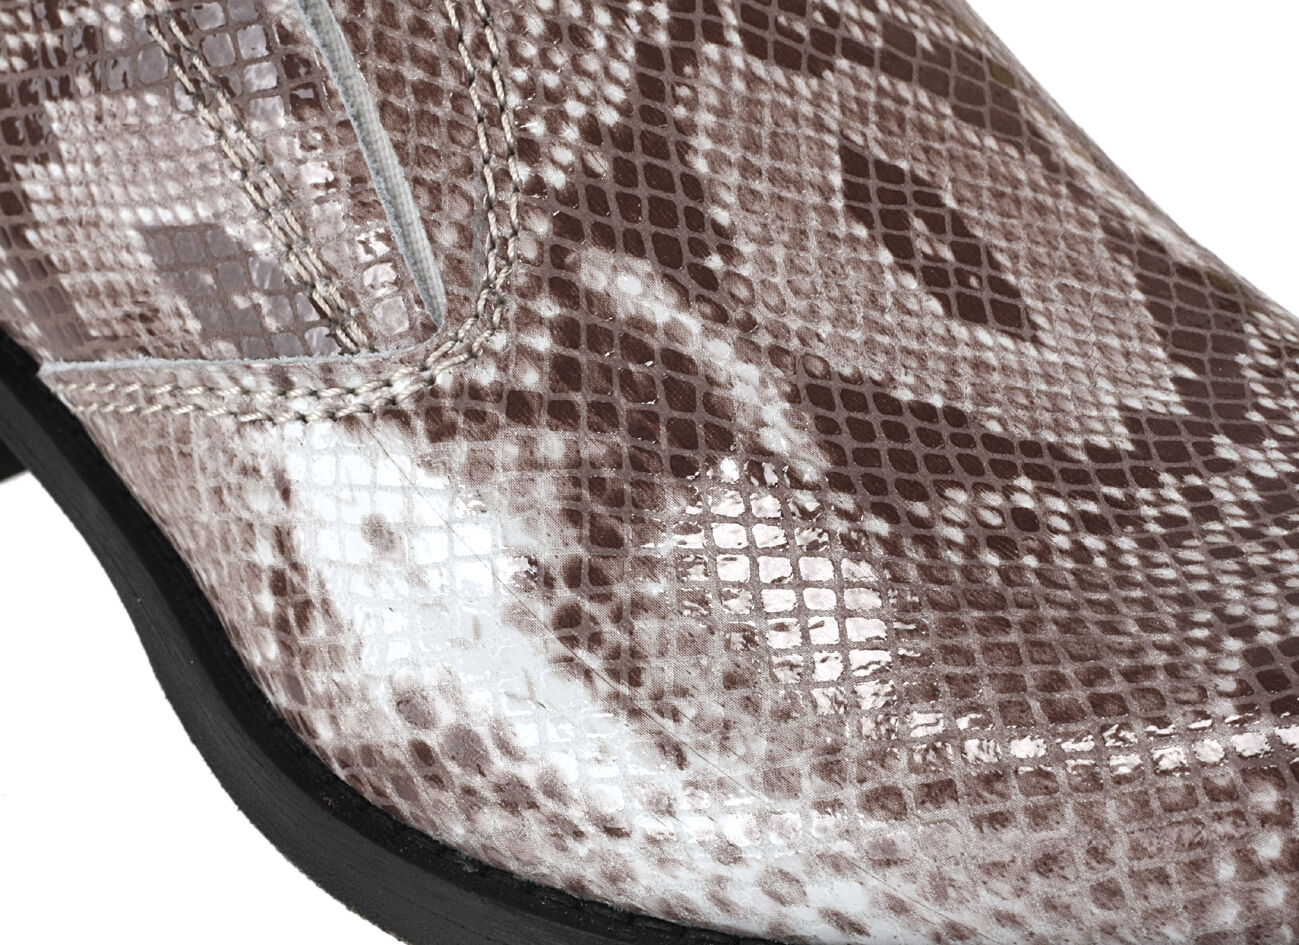 Comodo Hand made cowboy western stivali Sauro multi Leather siz siz siz 44 Snakeskin print a06109